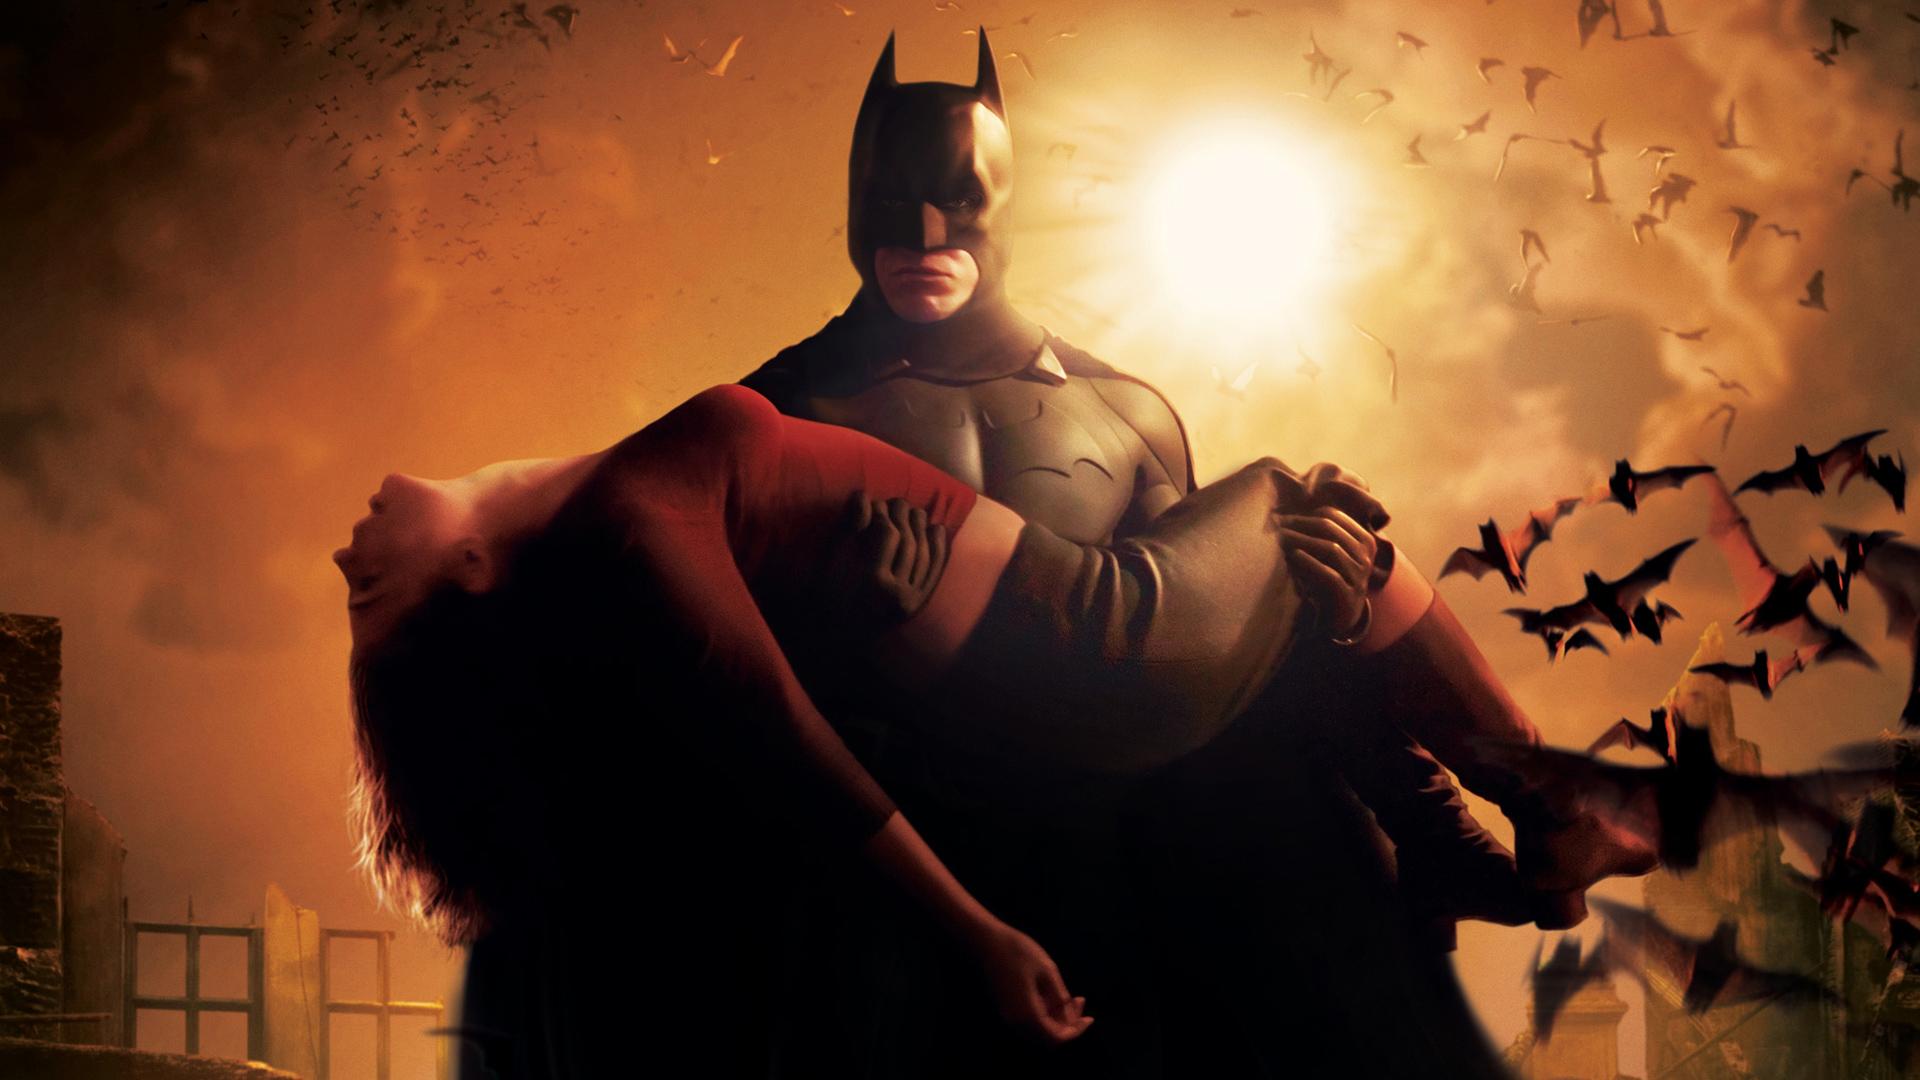 Batman Begins Wallpapers HD Wallpapers 1920x1080